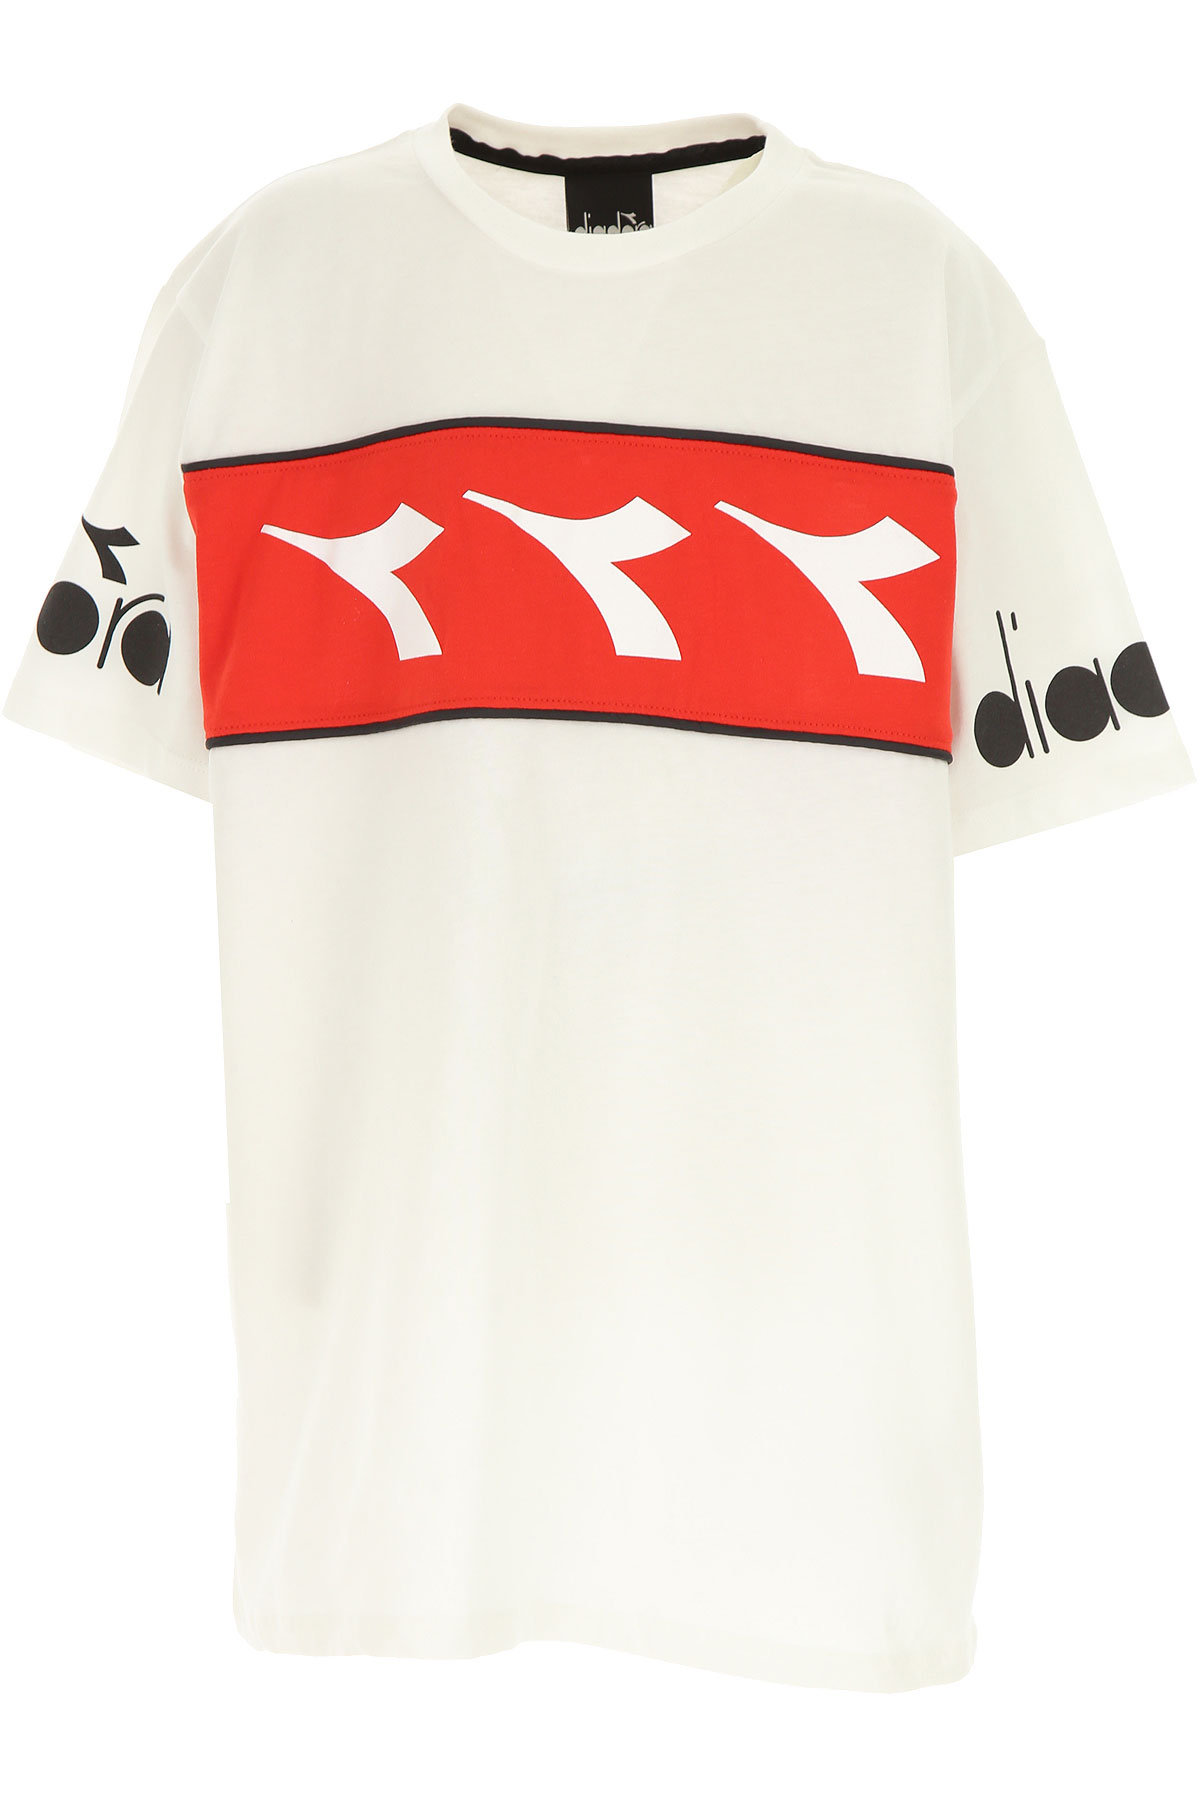 Diadora Kids T-Shirt for Boys On Sale, White, Cotton, 2019, 10Y 12Y 14Y 8Y